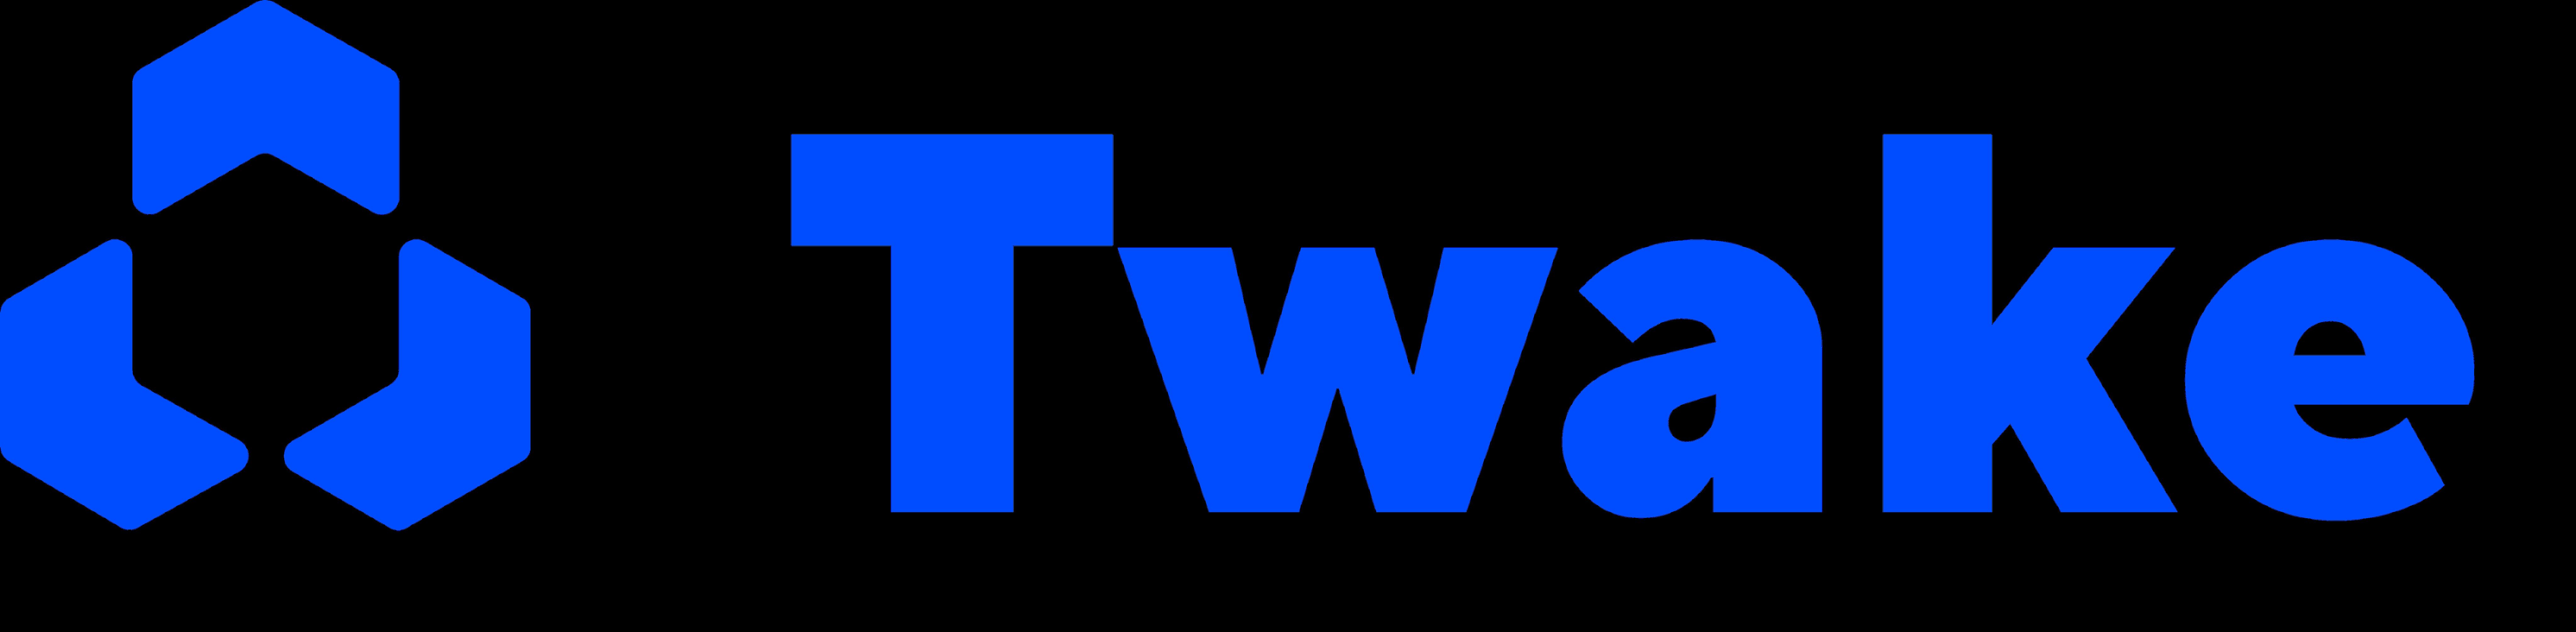 Twake